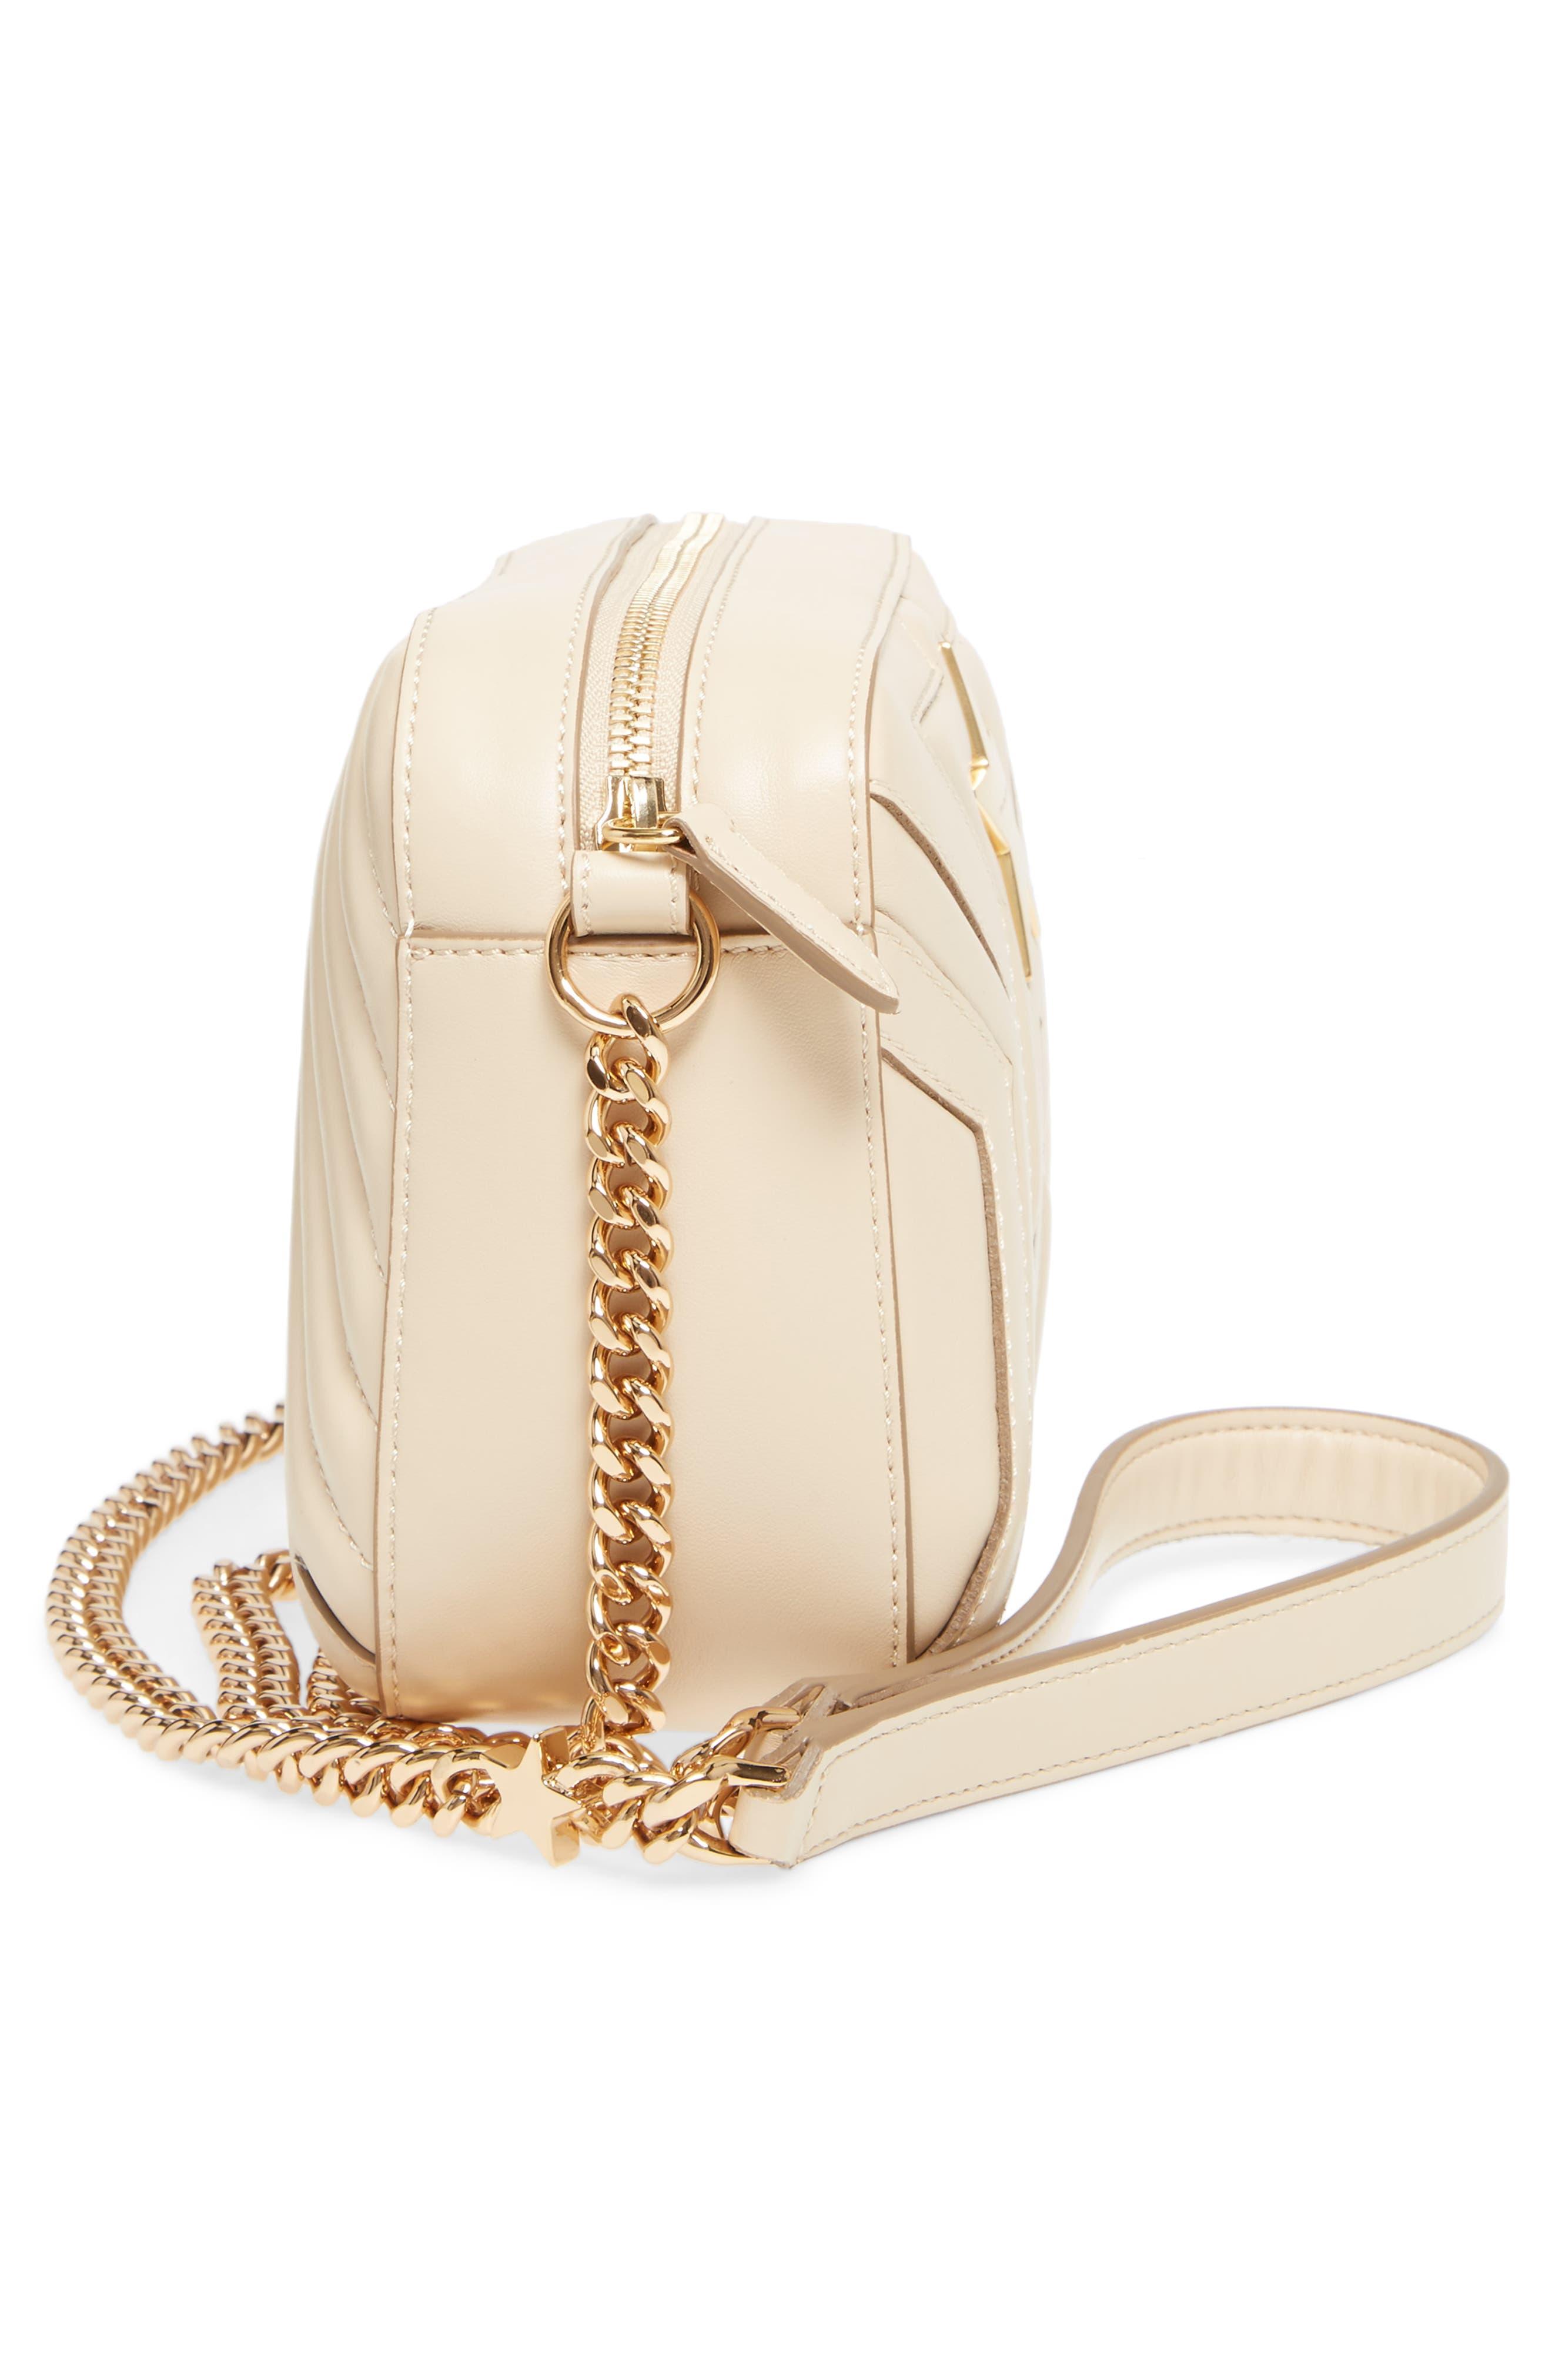 Alter Nappa Faux Leather Shoulder Bag,                             Alternate thumbnail 4, color,                             Cream